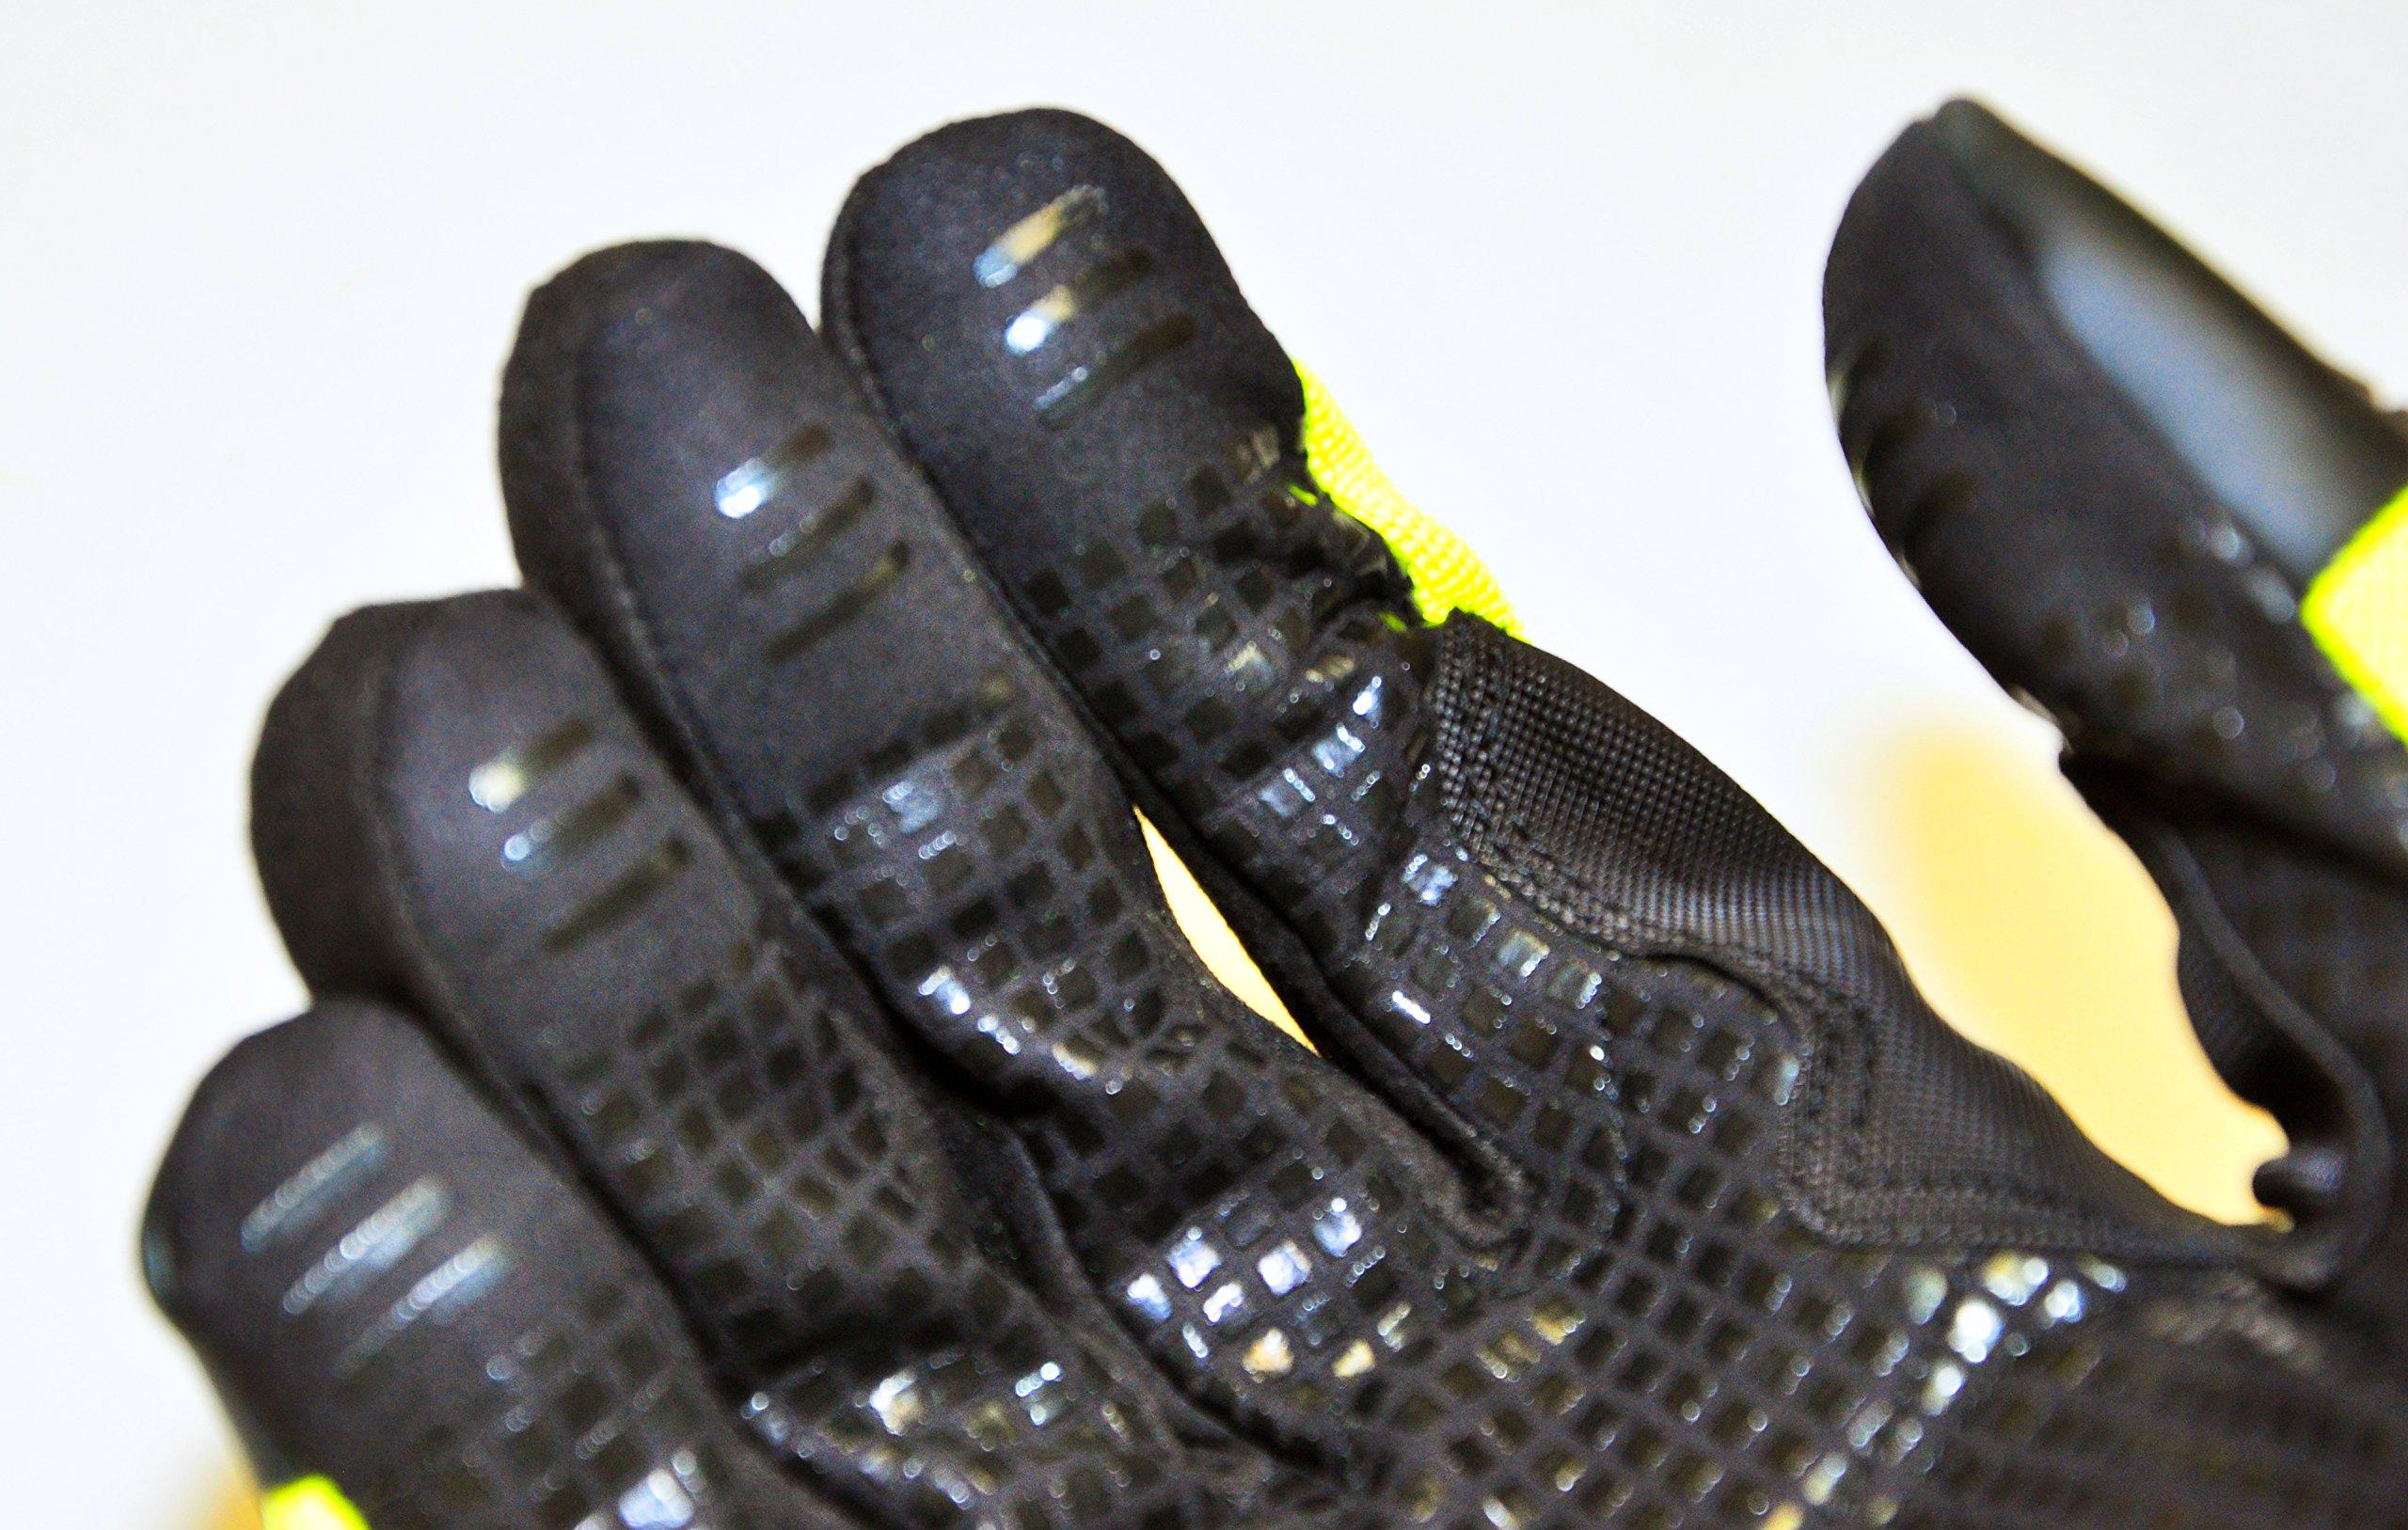 HAWK PRO PRO-0511XL Anti Slip Mechanics Glove, X-Large, Green by Hawk (Image #3)